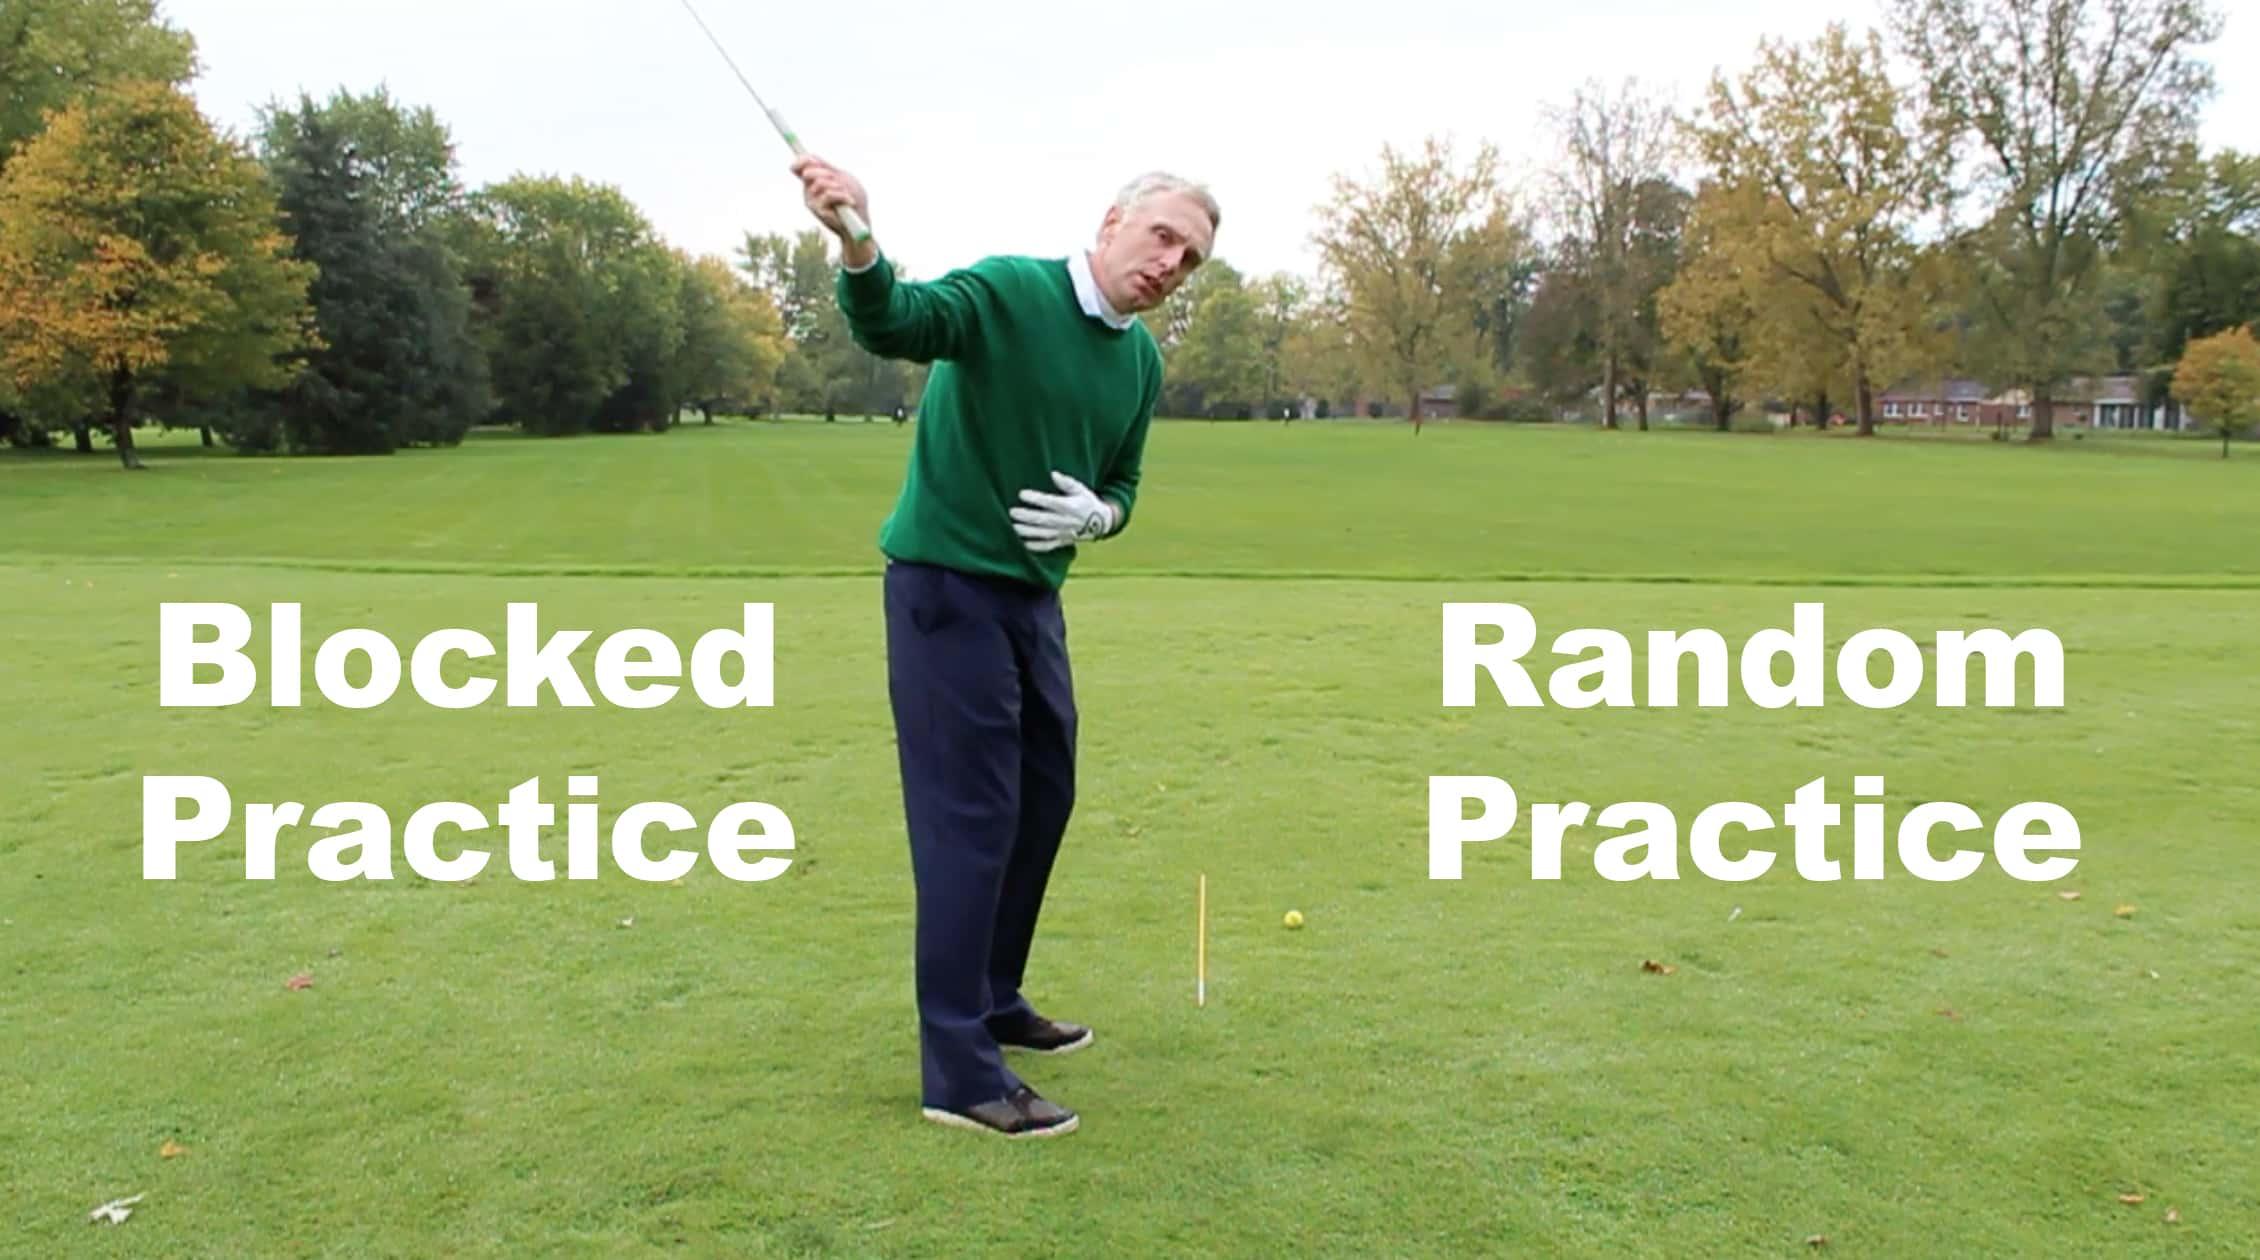 Blocked Practice and Random Practice are great driving range practice tips.